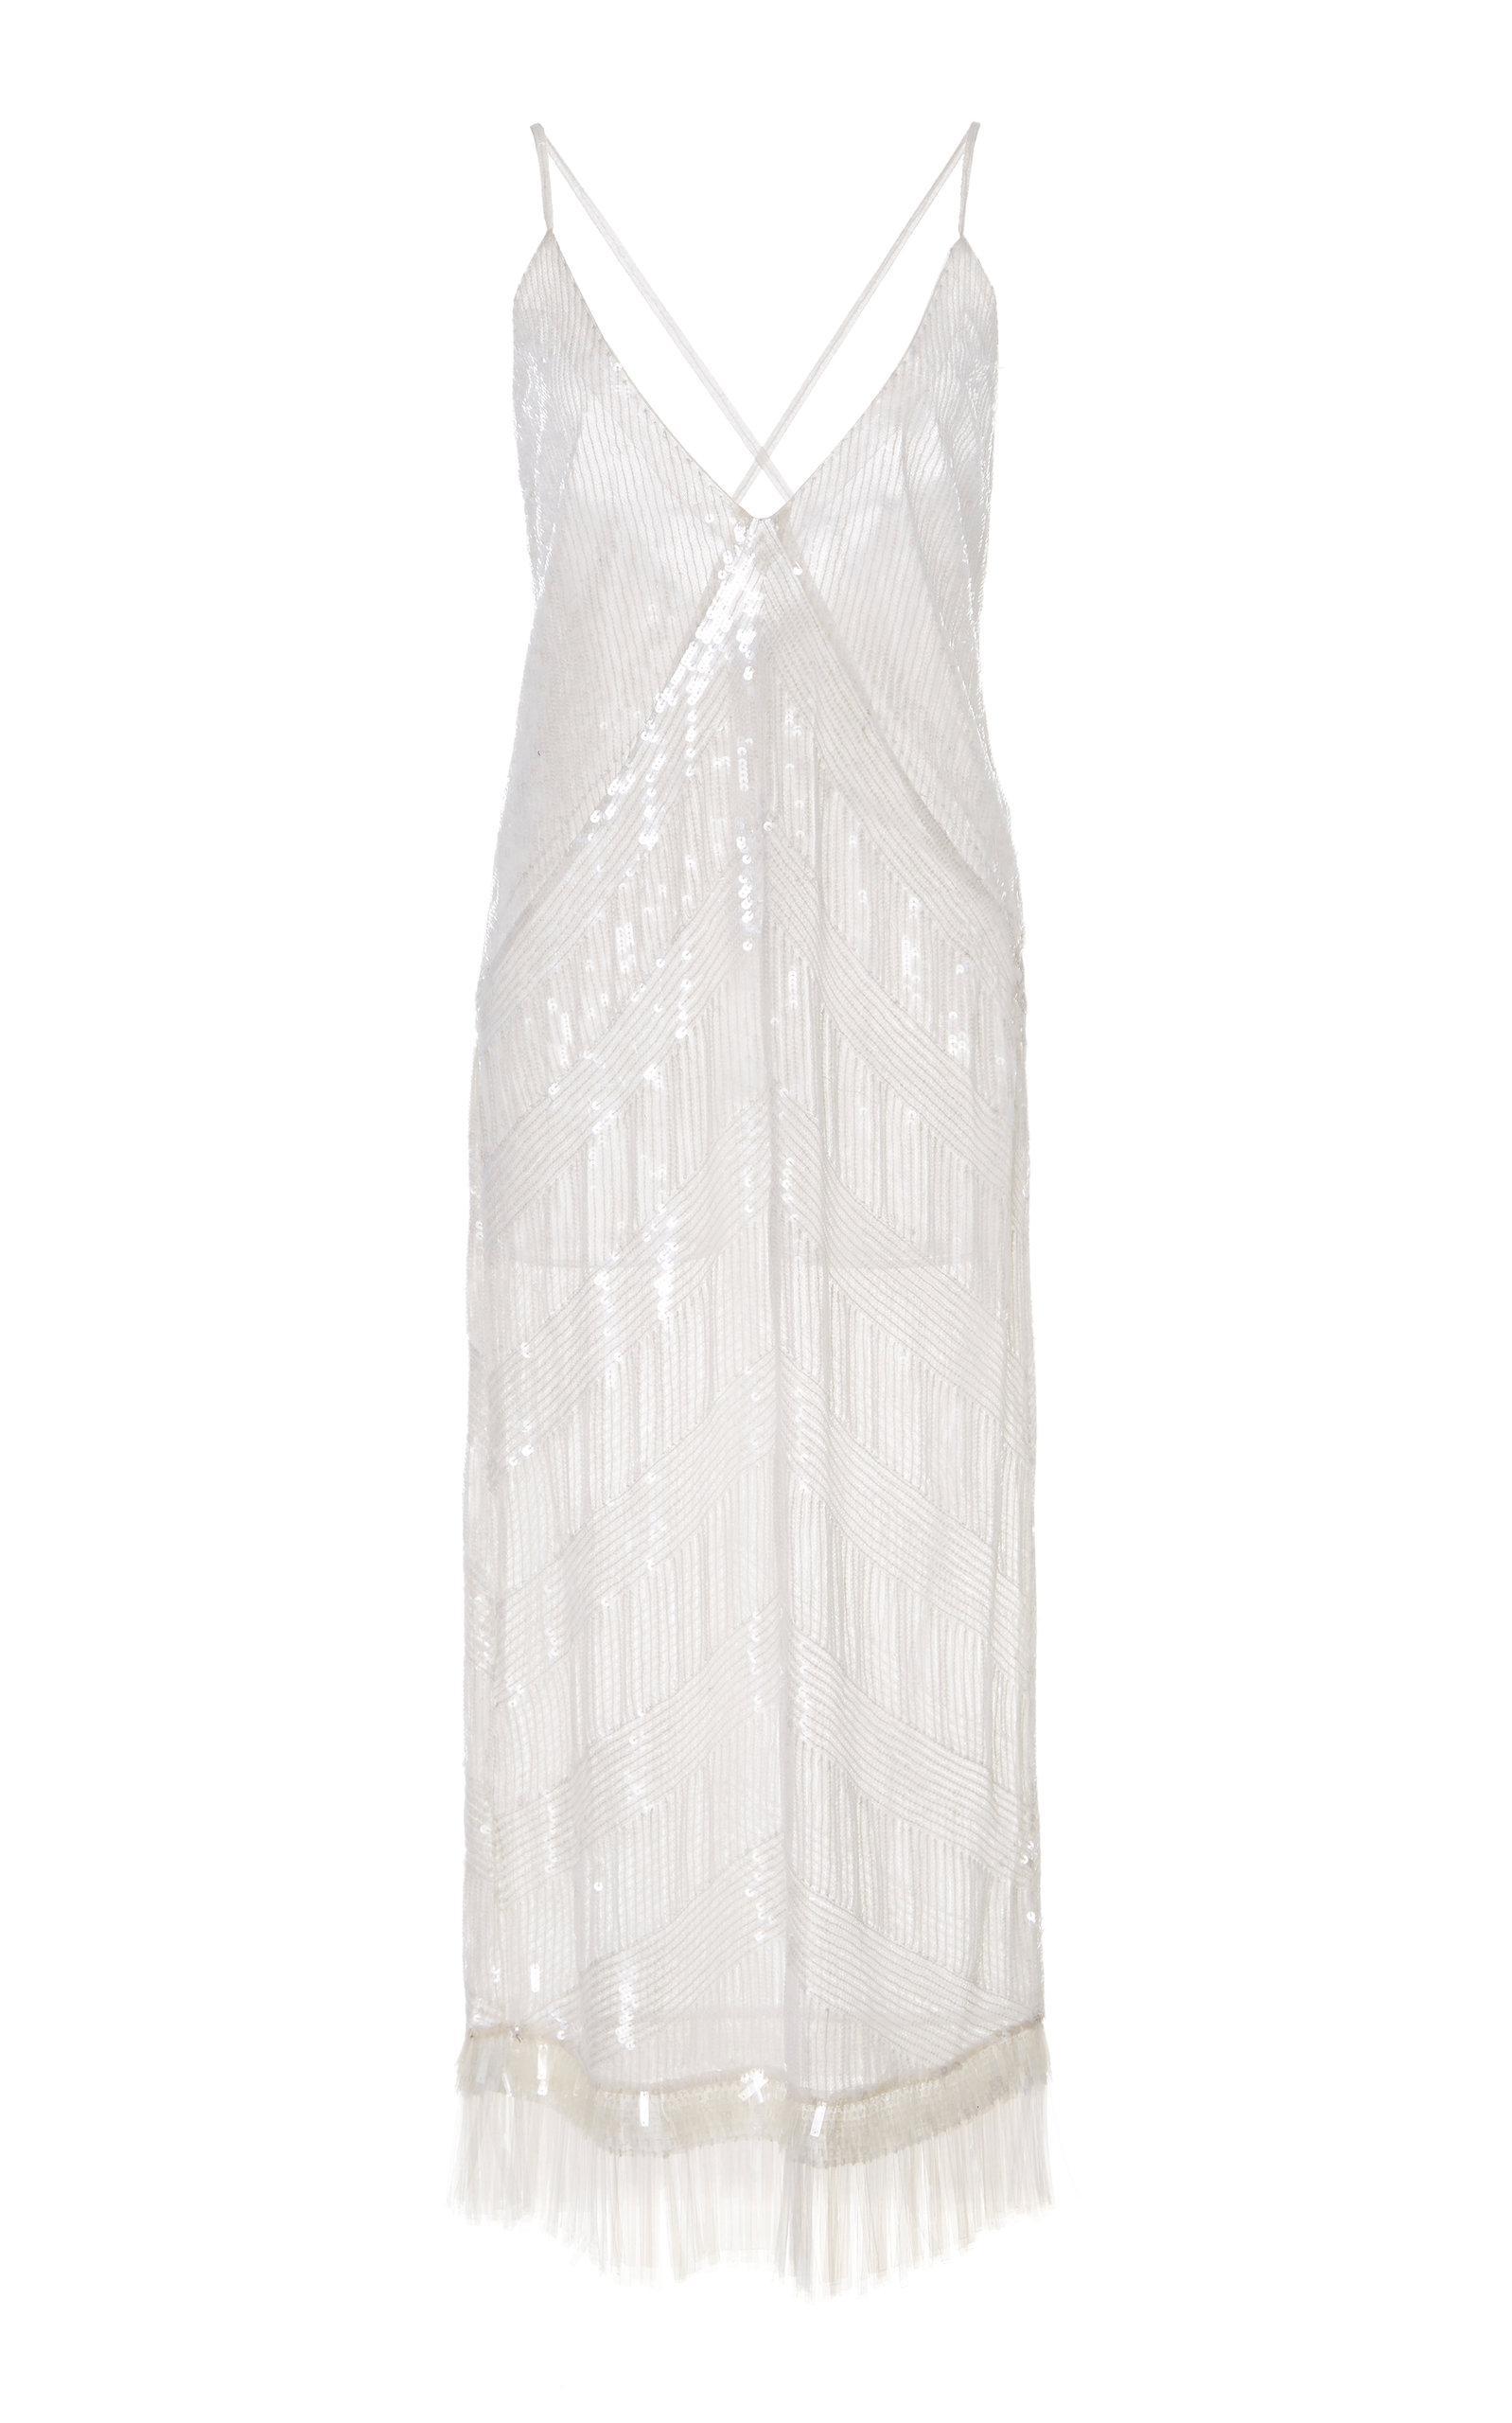 Rahul Mishra Eclat Fringe Dress In White